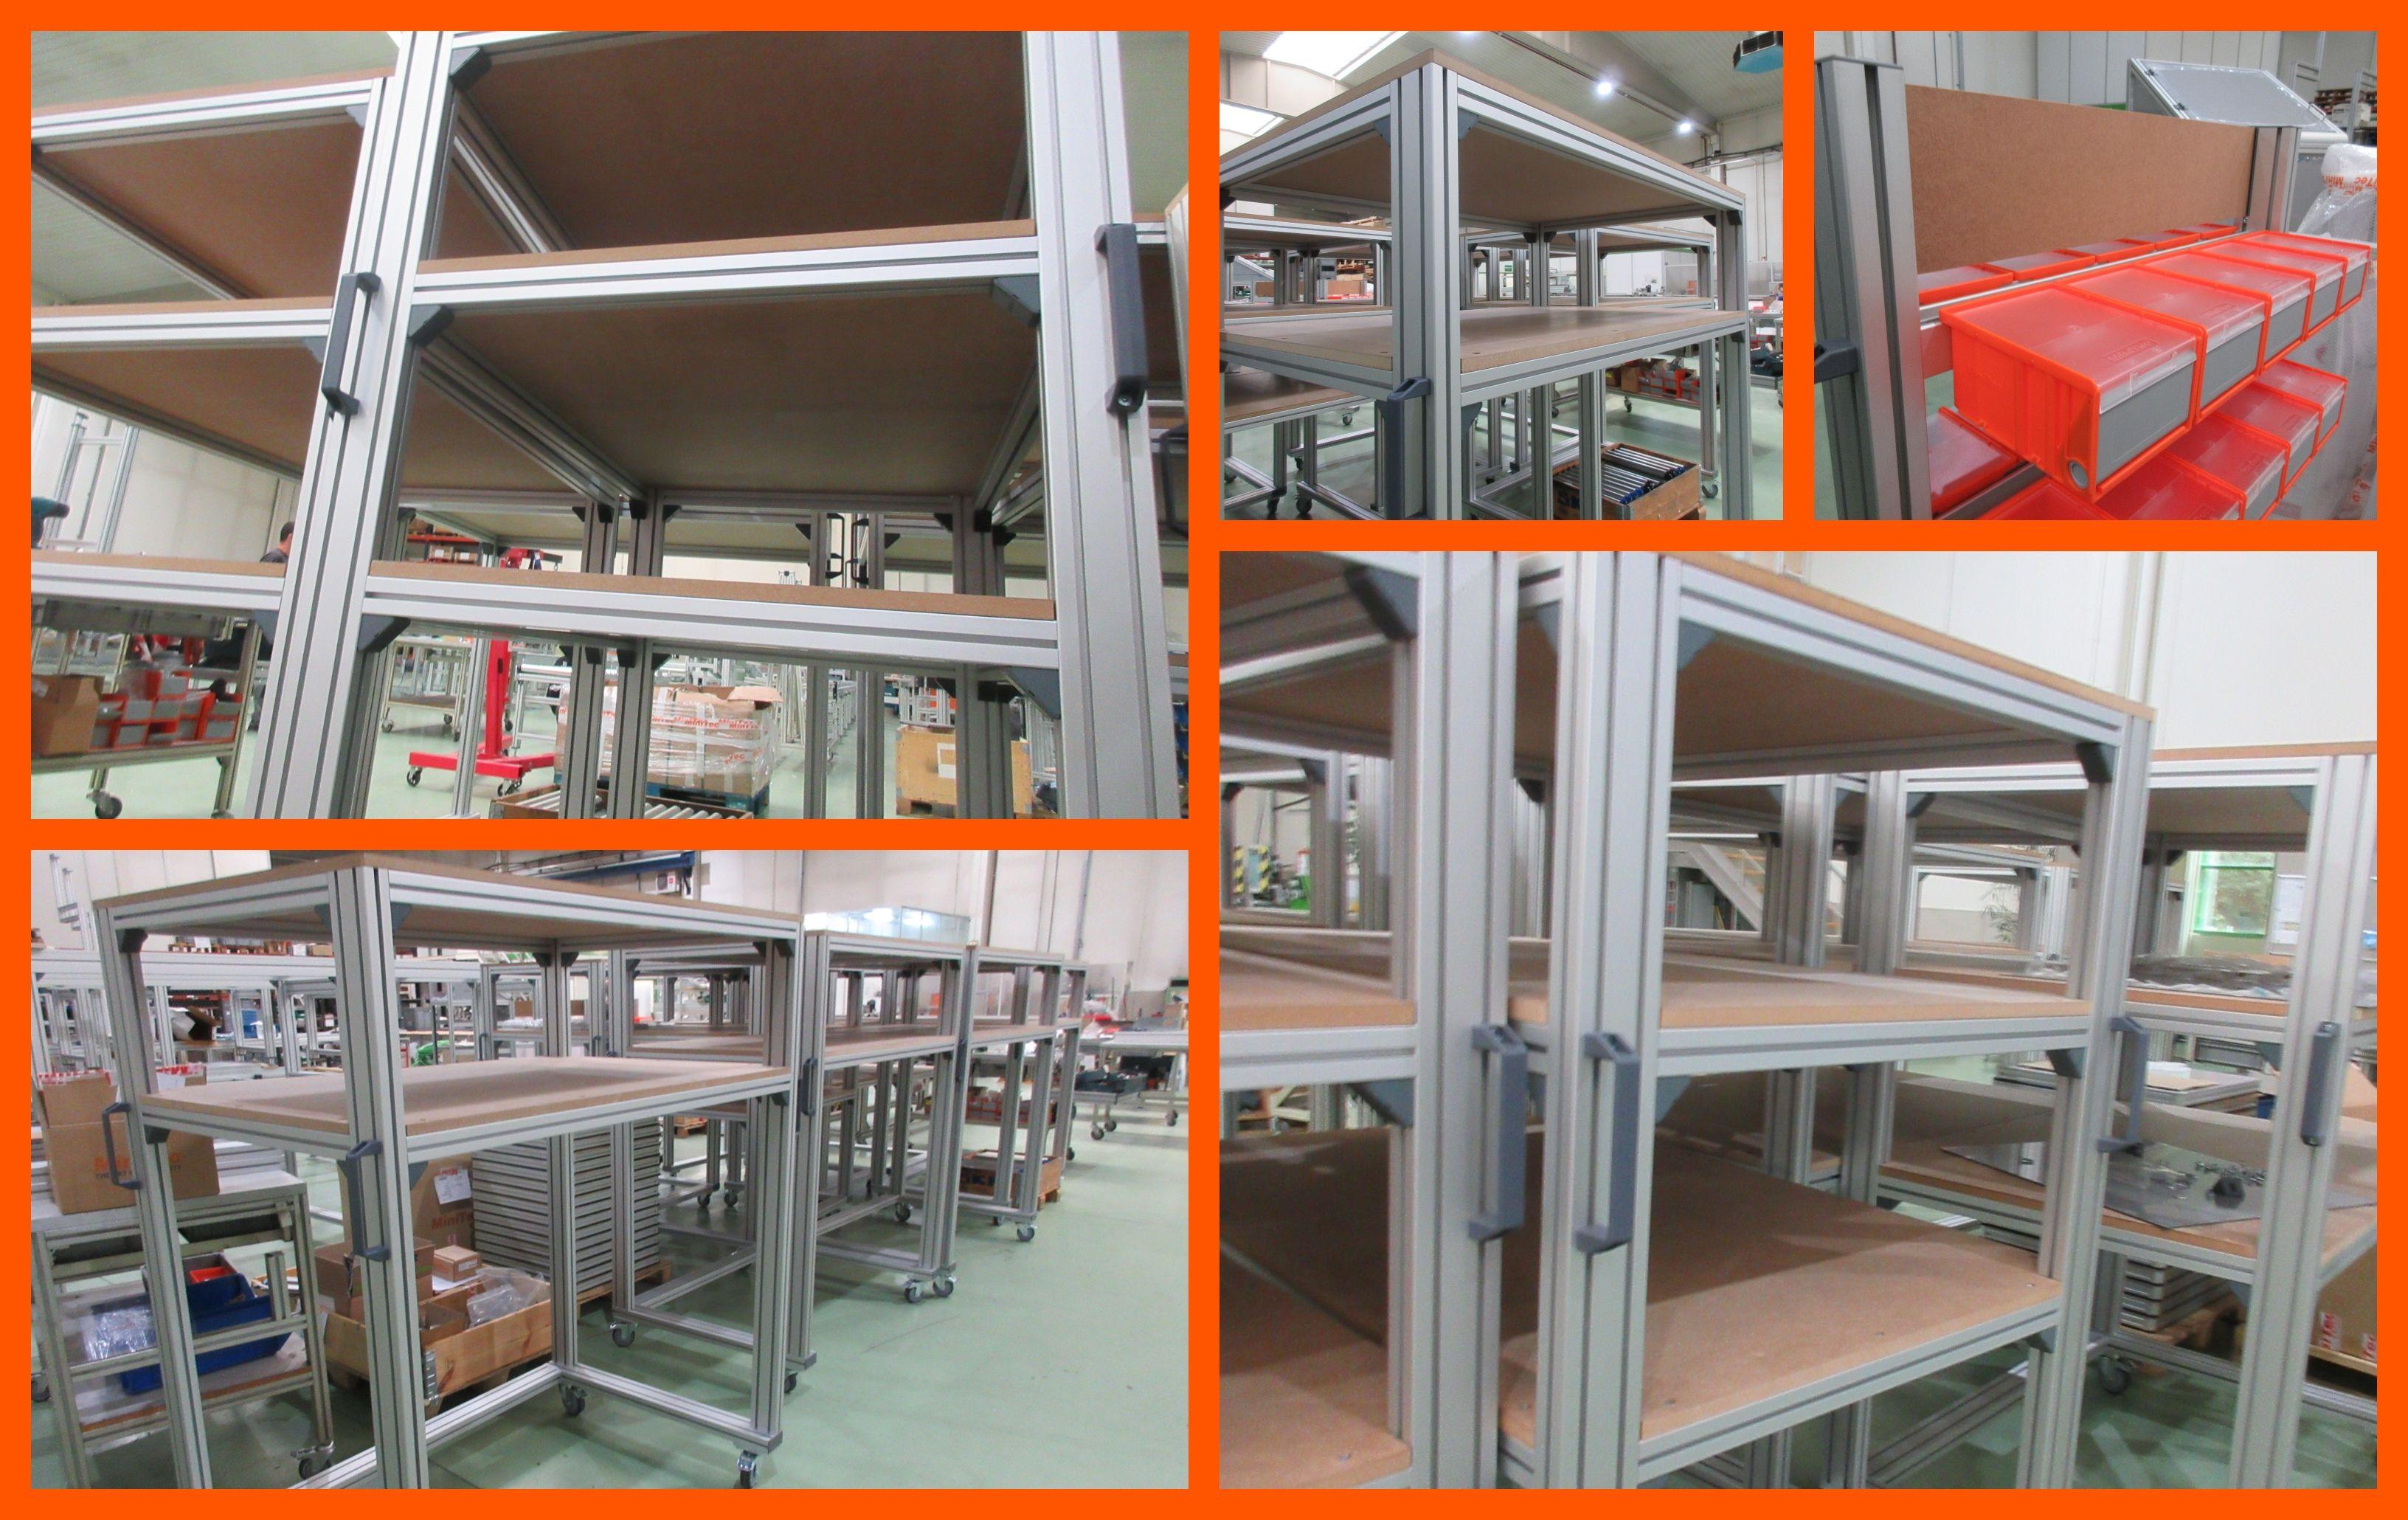 Estructuras De Aluminio Minitec España Perfiles De Aluminio Aluminio Carpinteria Metalica